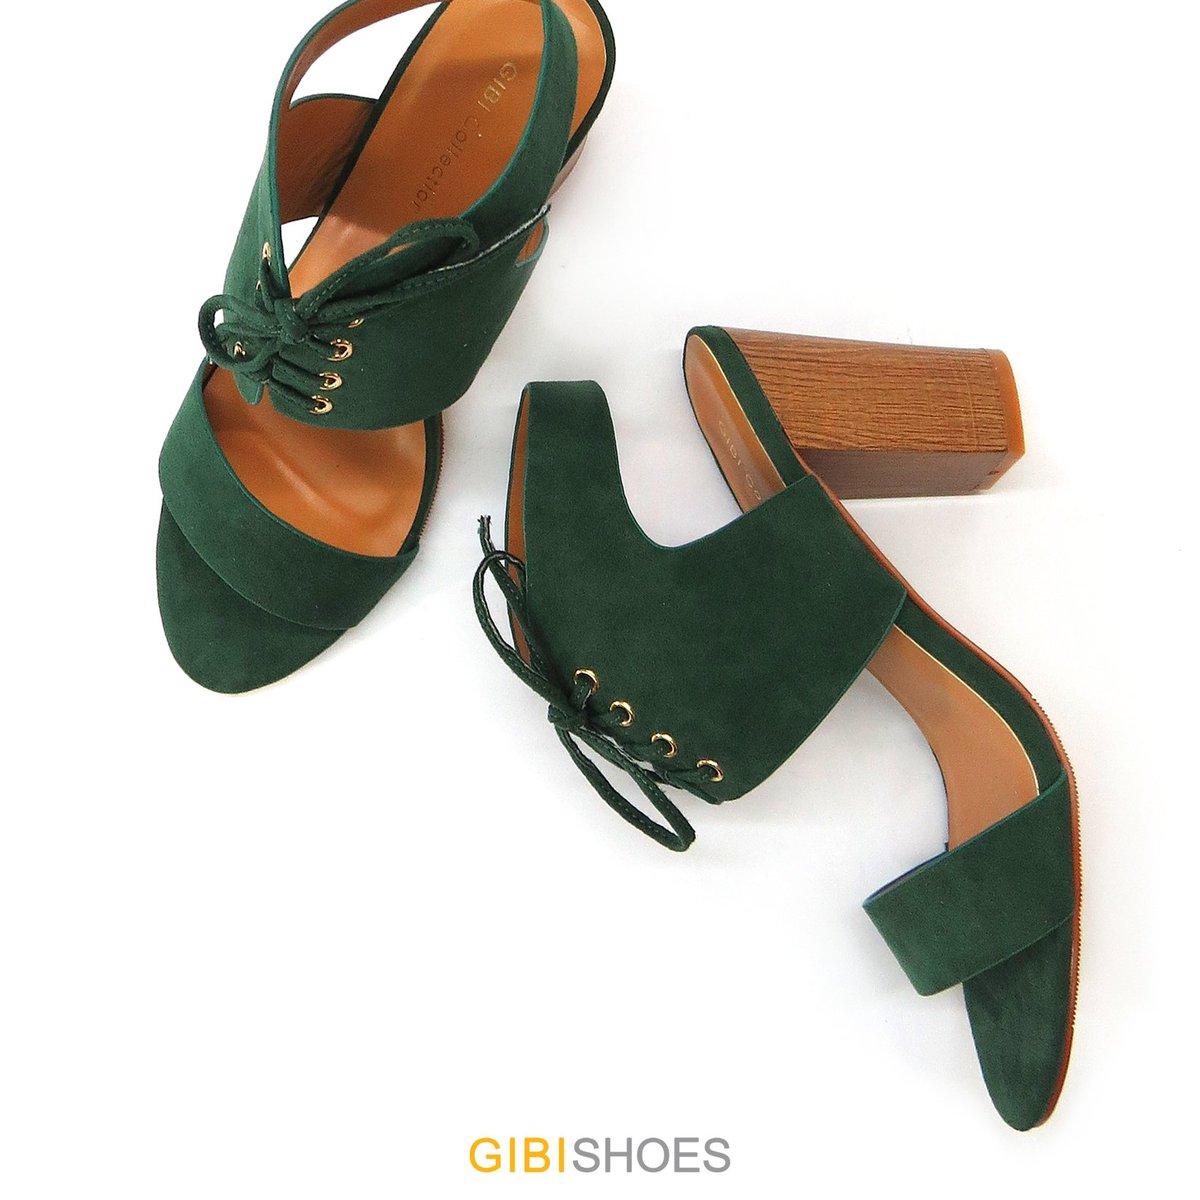 136531470af8 Gibi Shoes ( gibishoes)